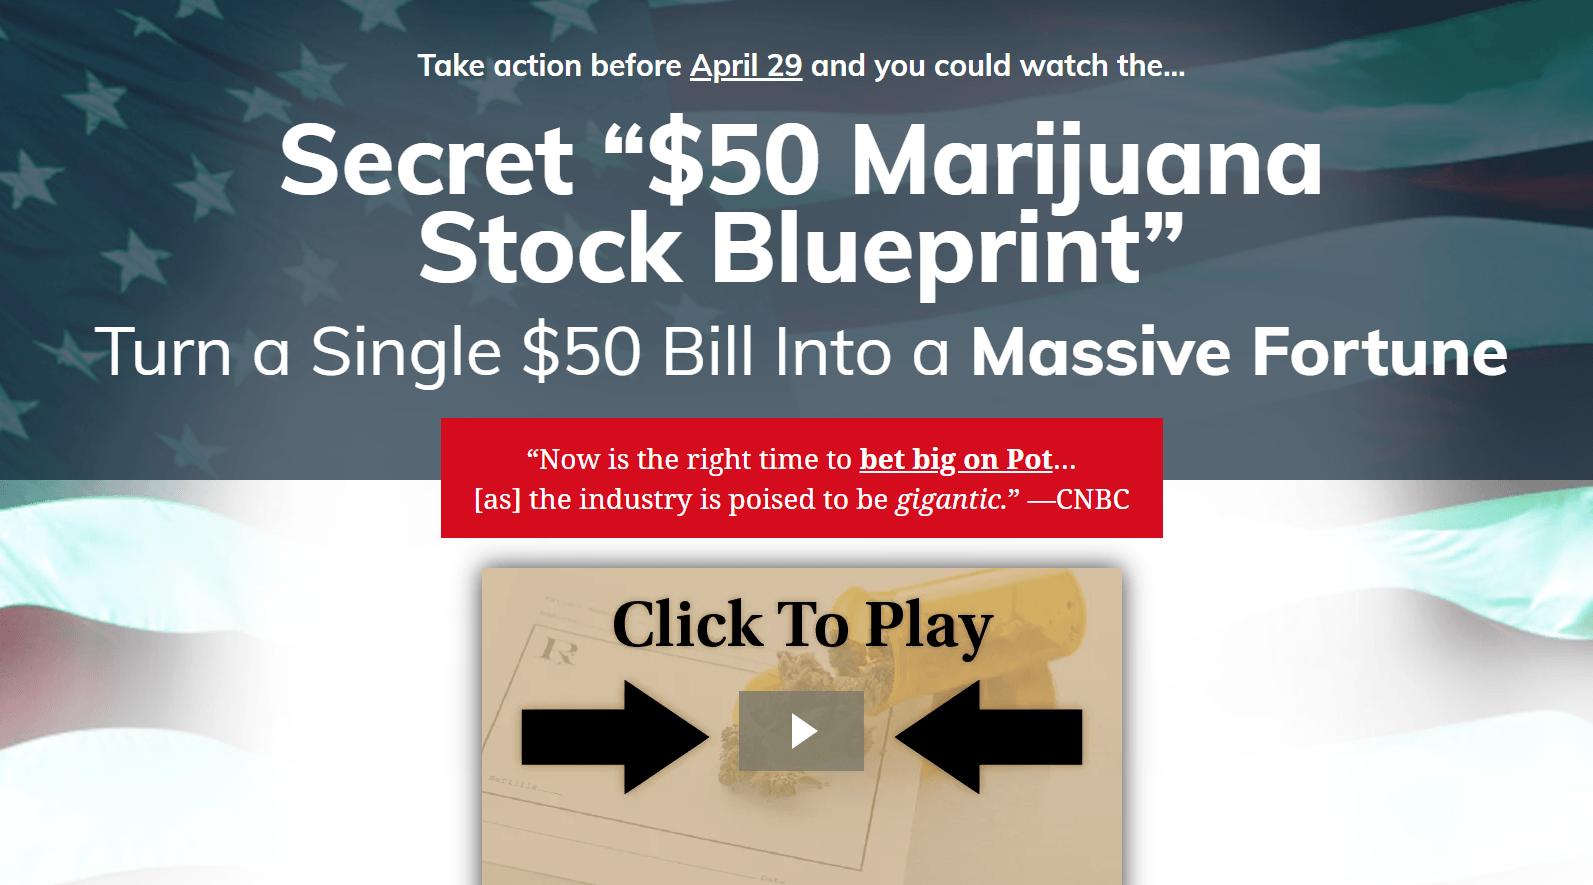 The $50 Marijuana Blueprint